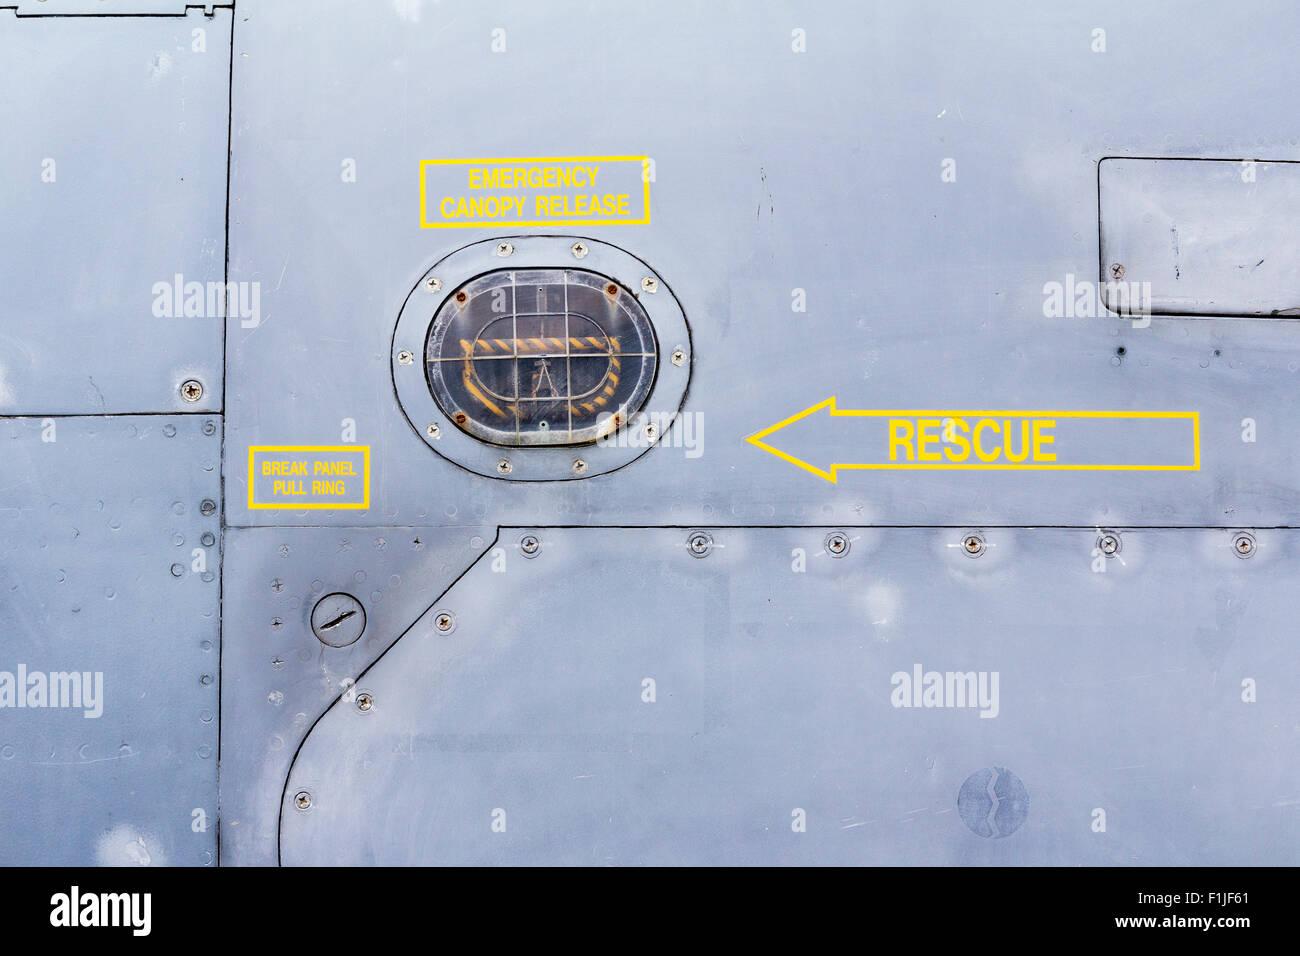 England, Manston airport museum. British Jaguar Fighter, rescue signs near cockpit - Stock Image